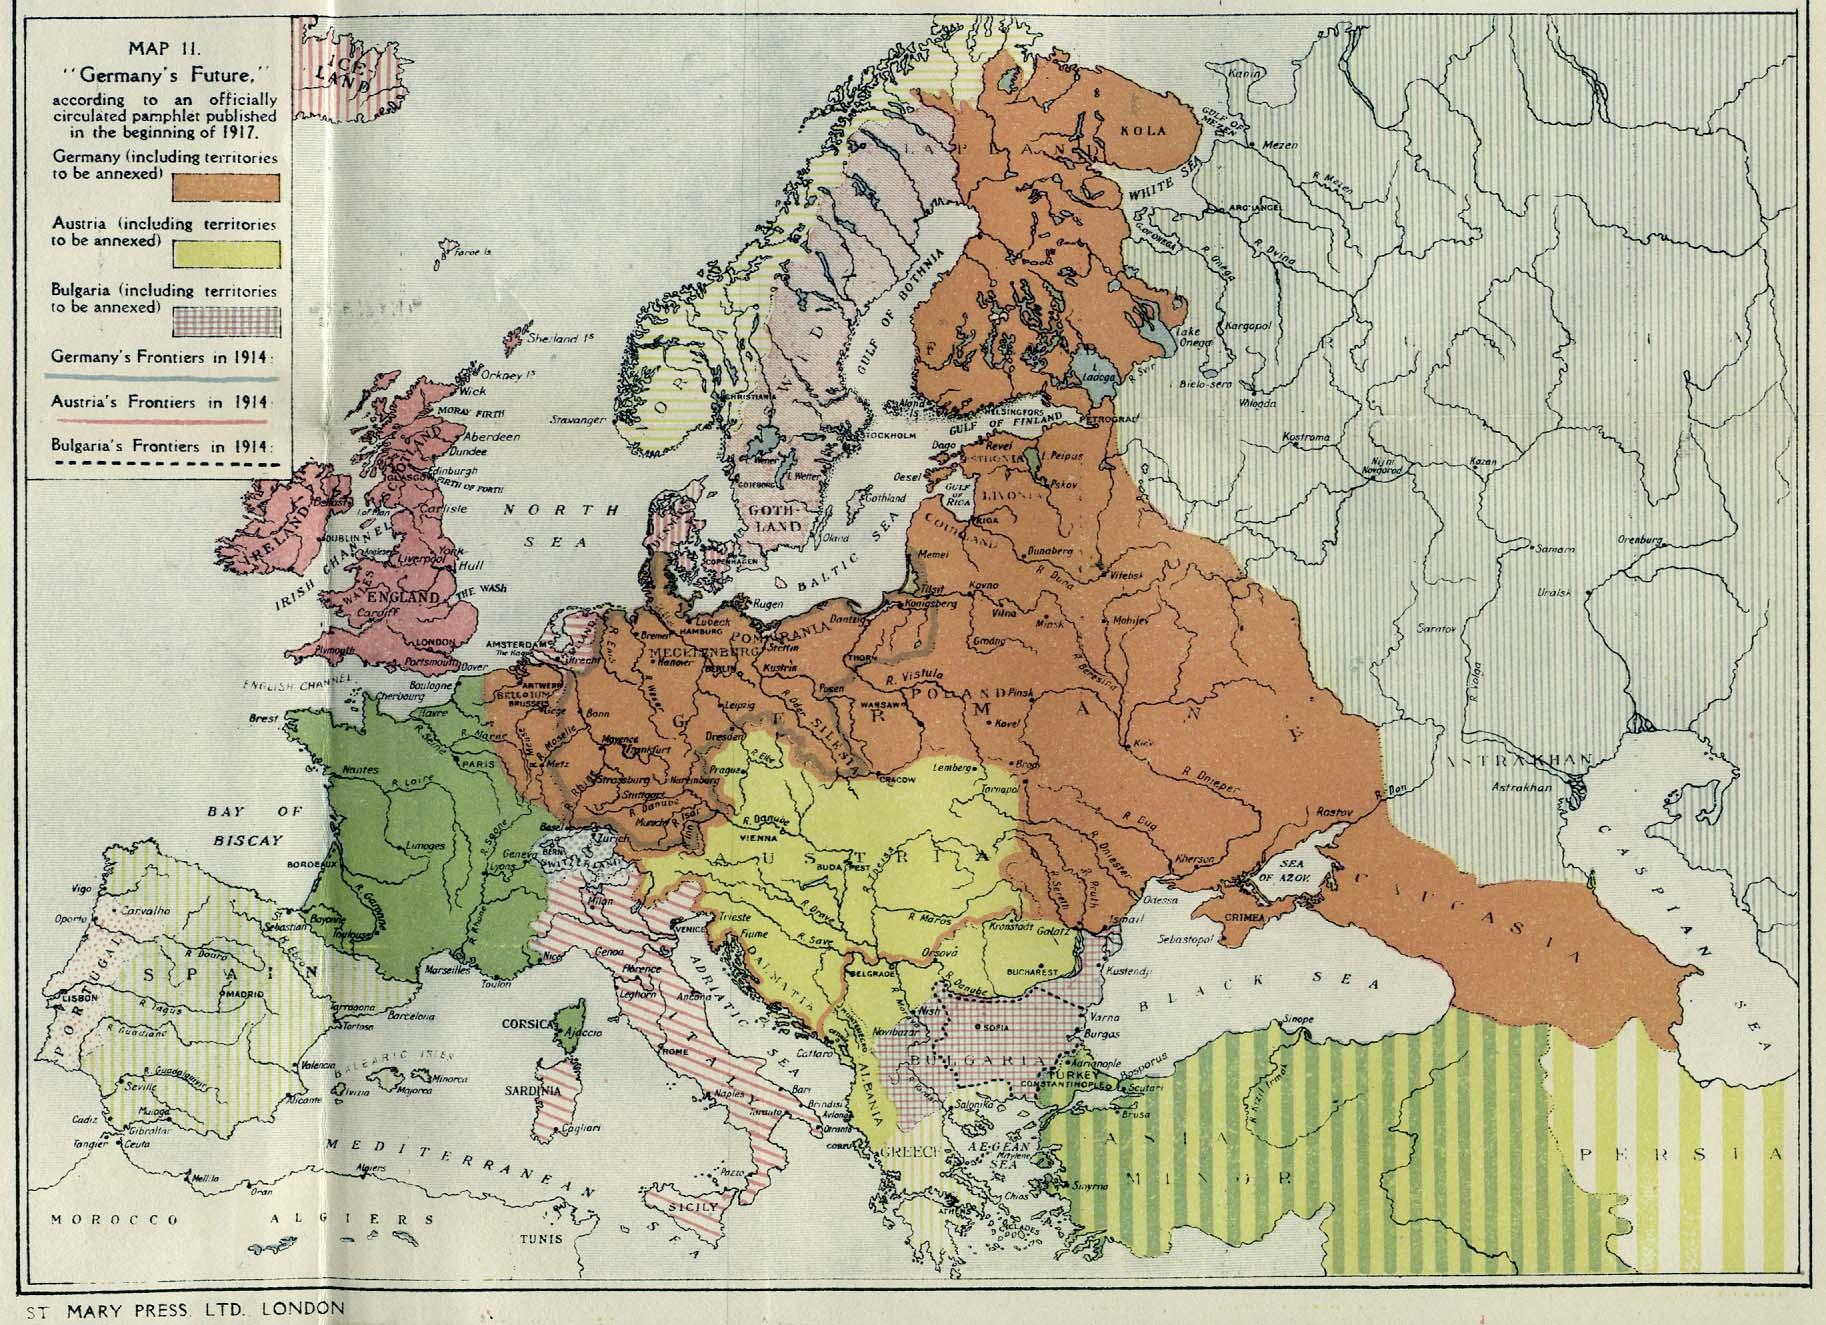 1917 British propaganda map showcasing alleged German